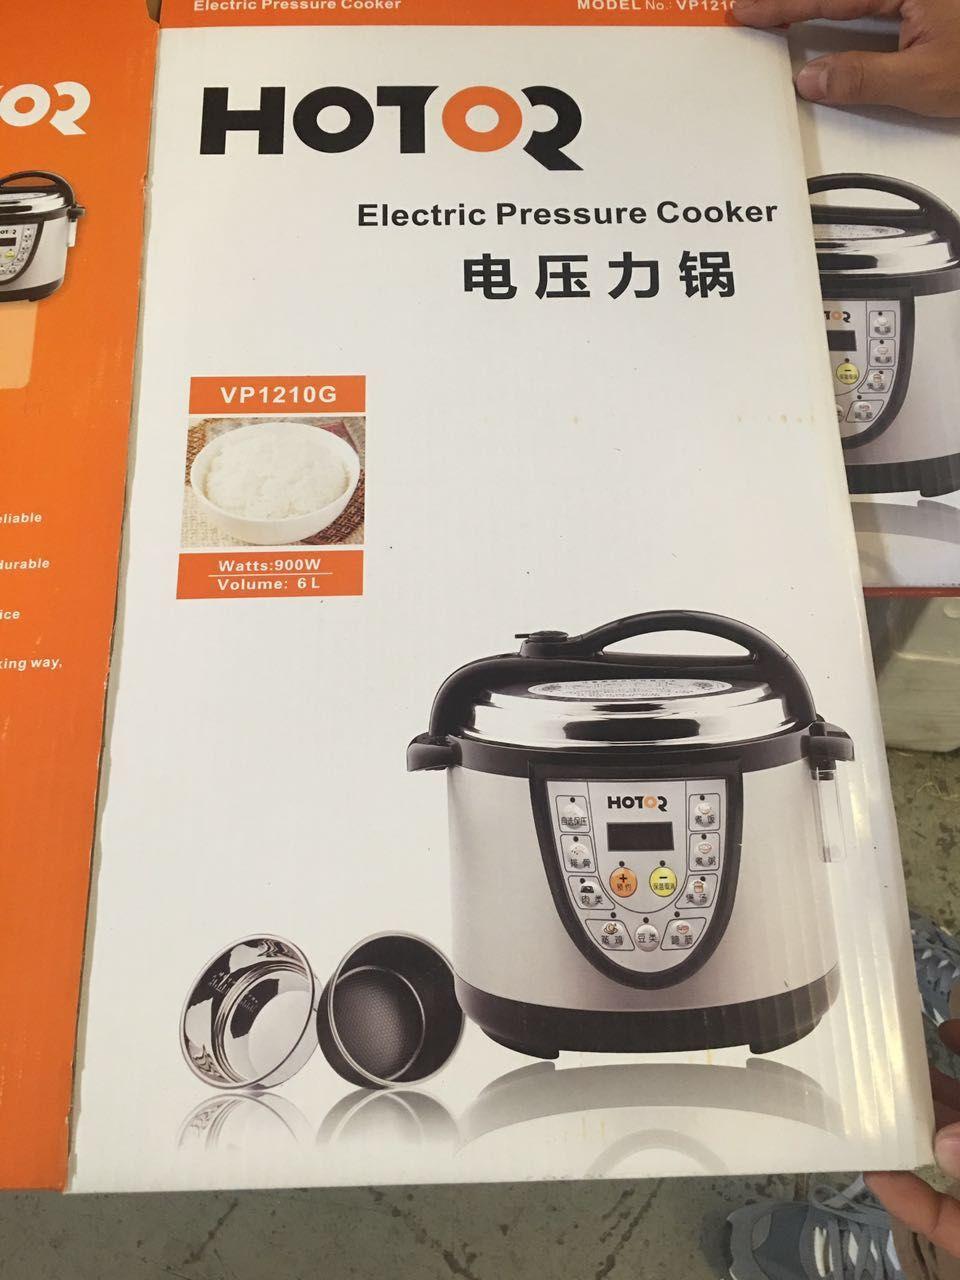 Hotor多功能电压力锅VP1210G外包装